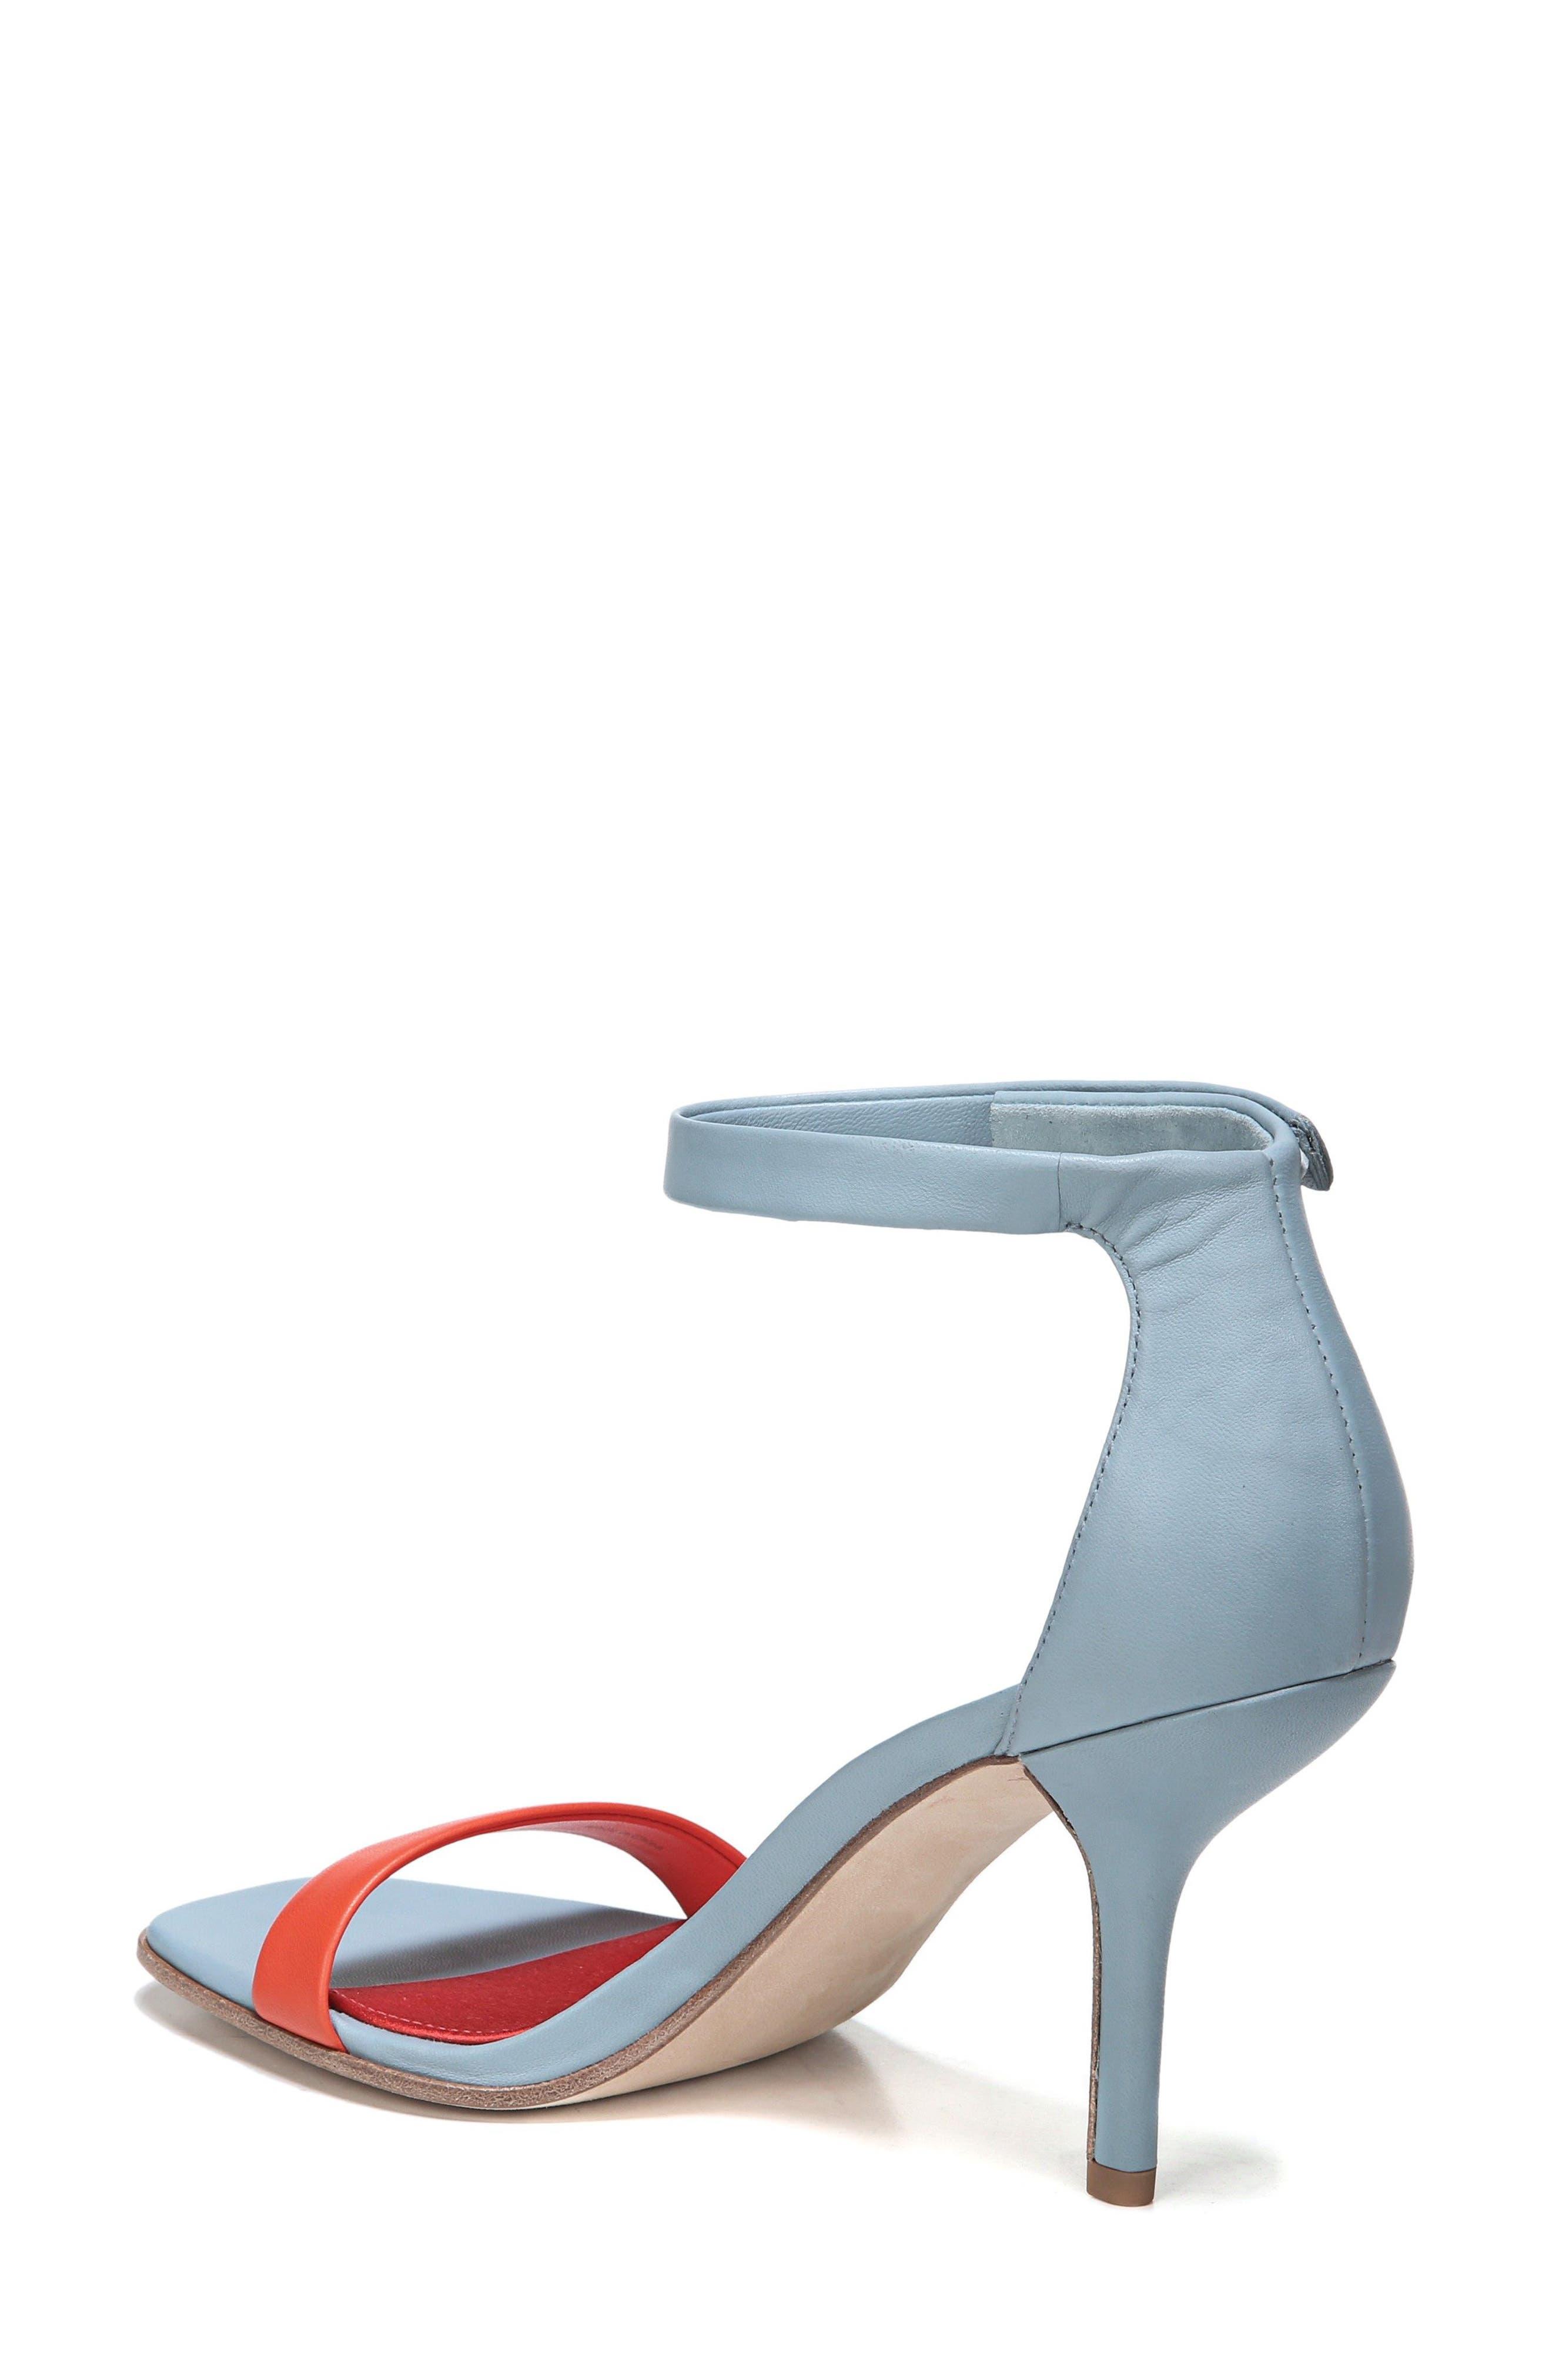 Ferrara Ankle Strap Sandal,                             Alternate thumbnail 5, color,